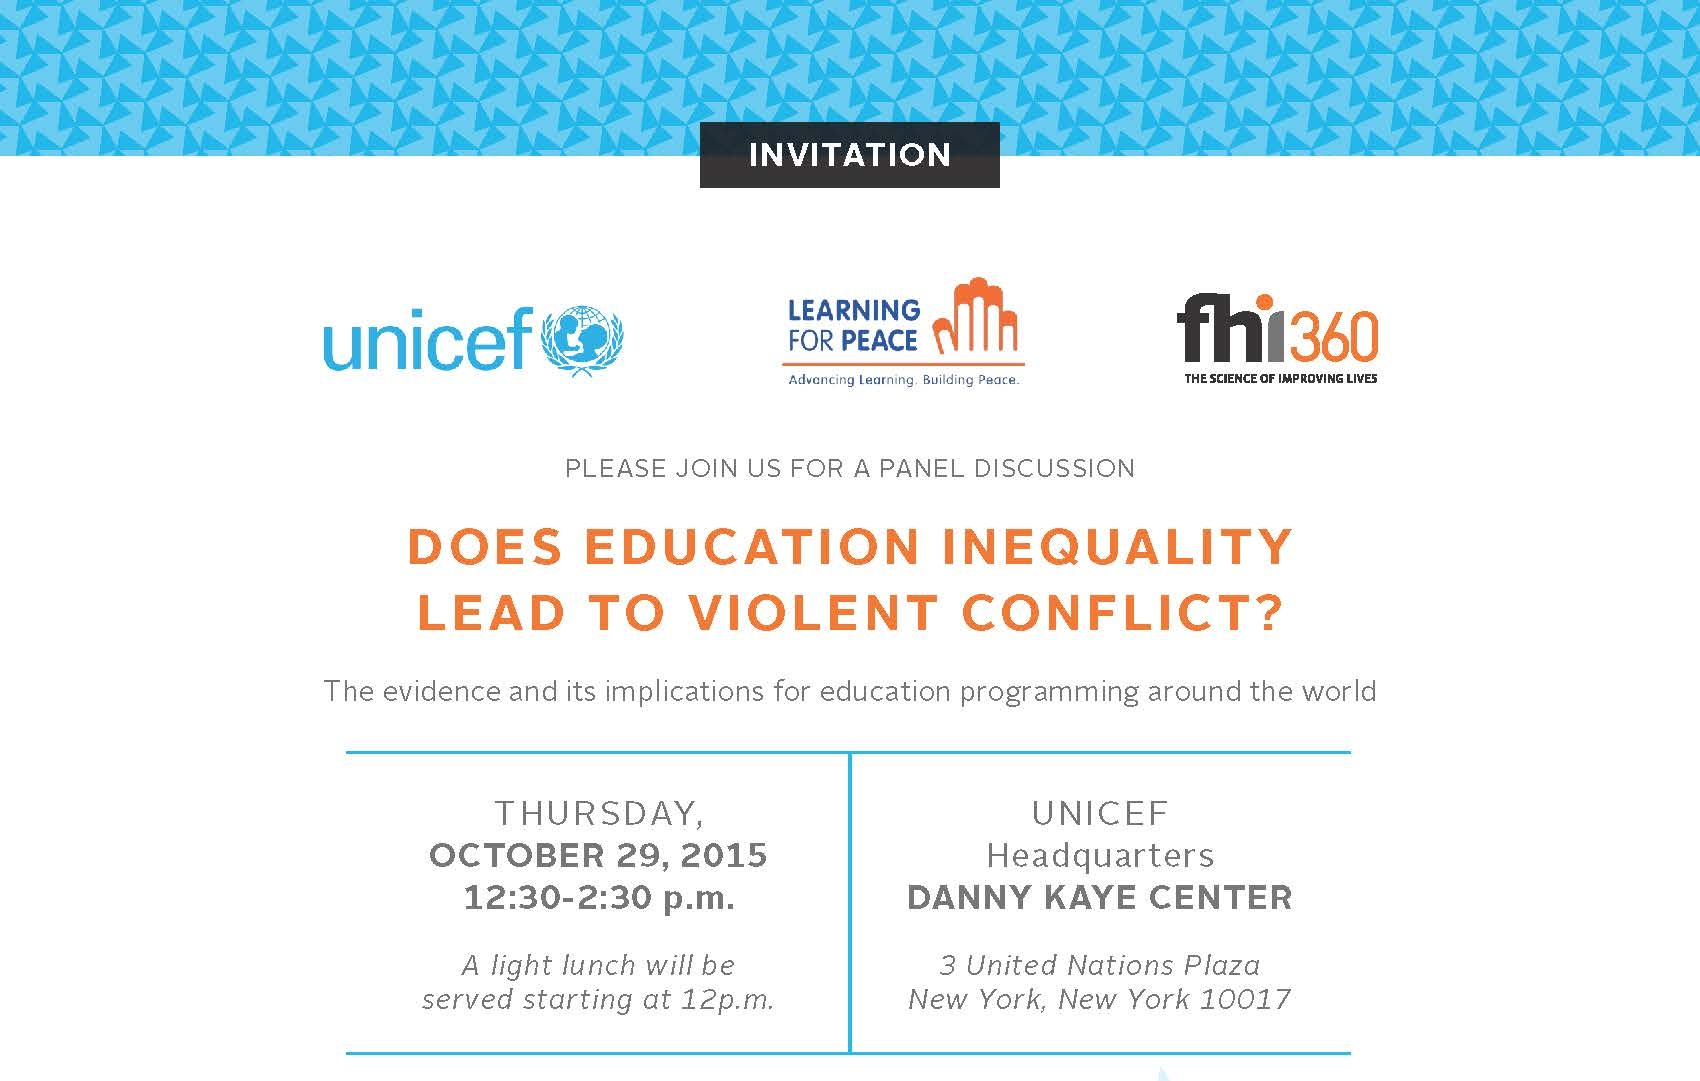 UNICEF_Event_Flyer.jpg